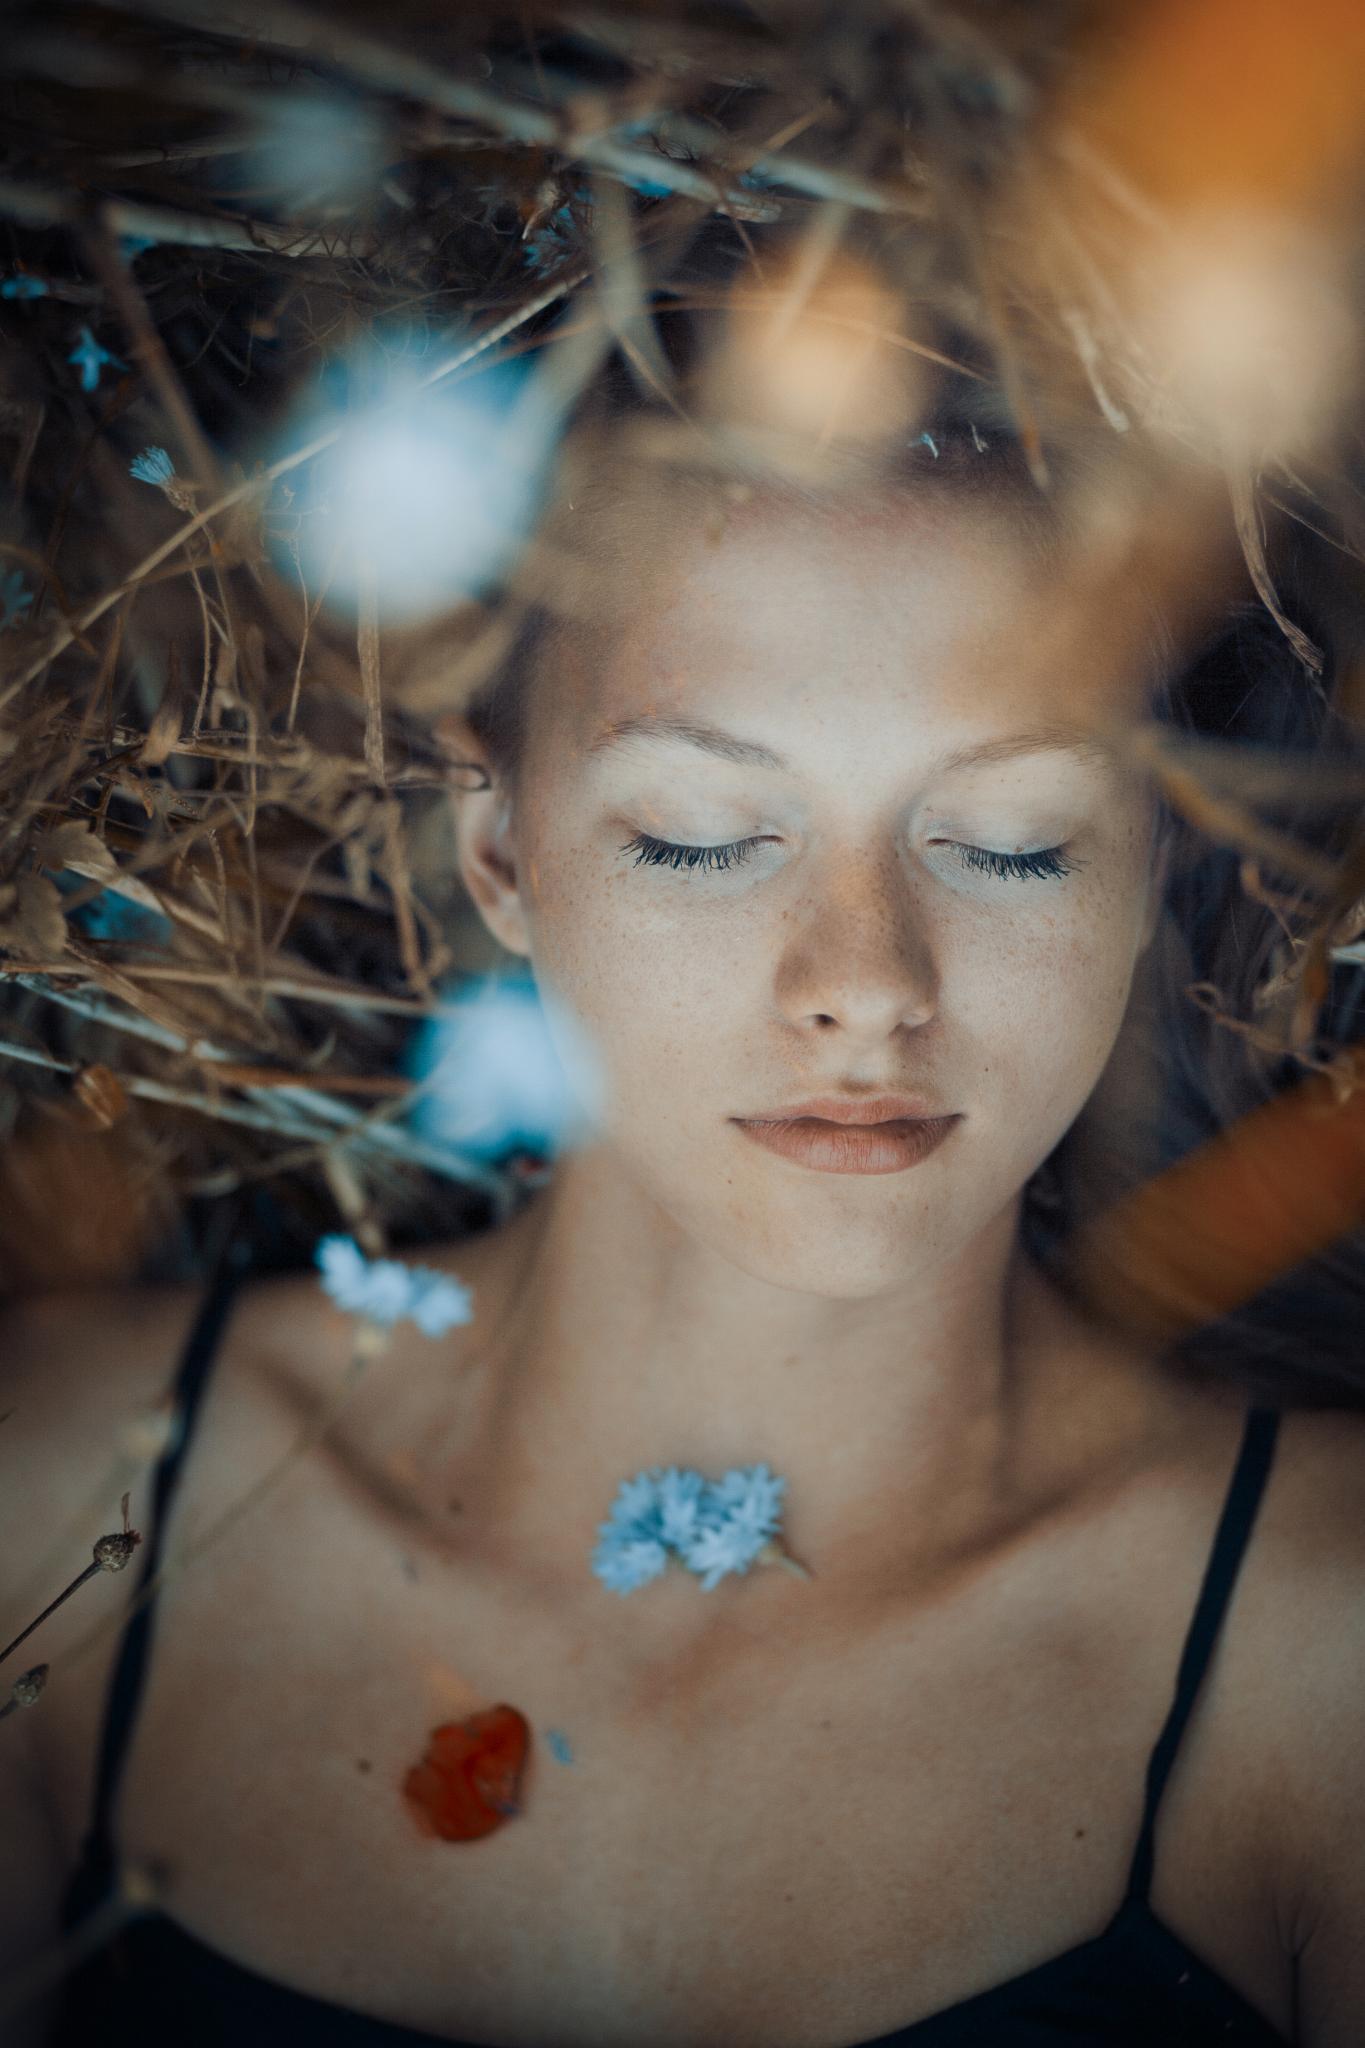 Daydreaming by Ildiko Neer